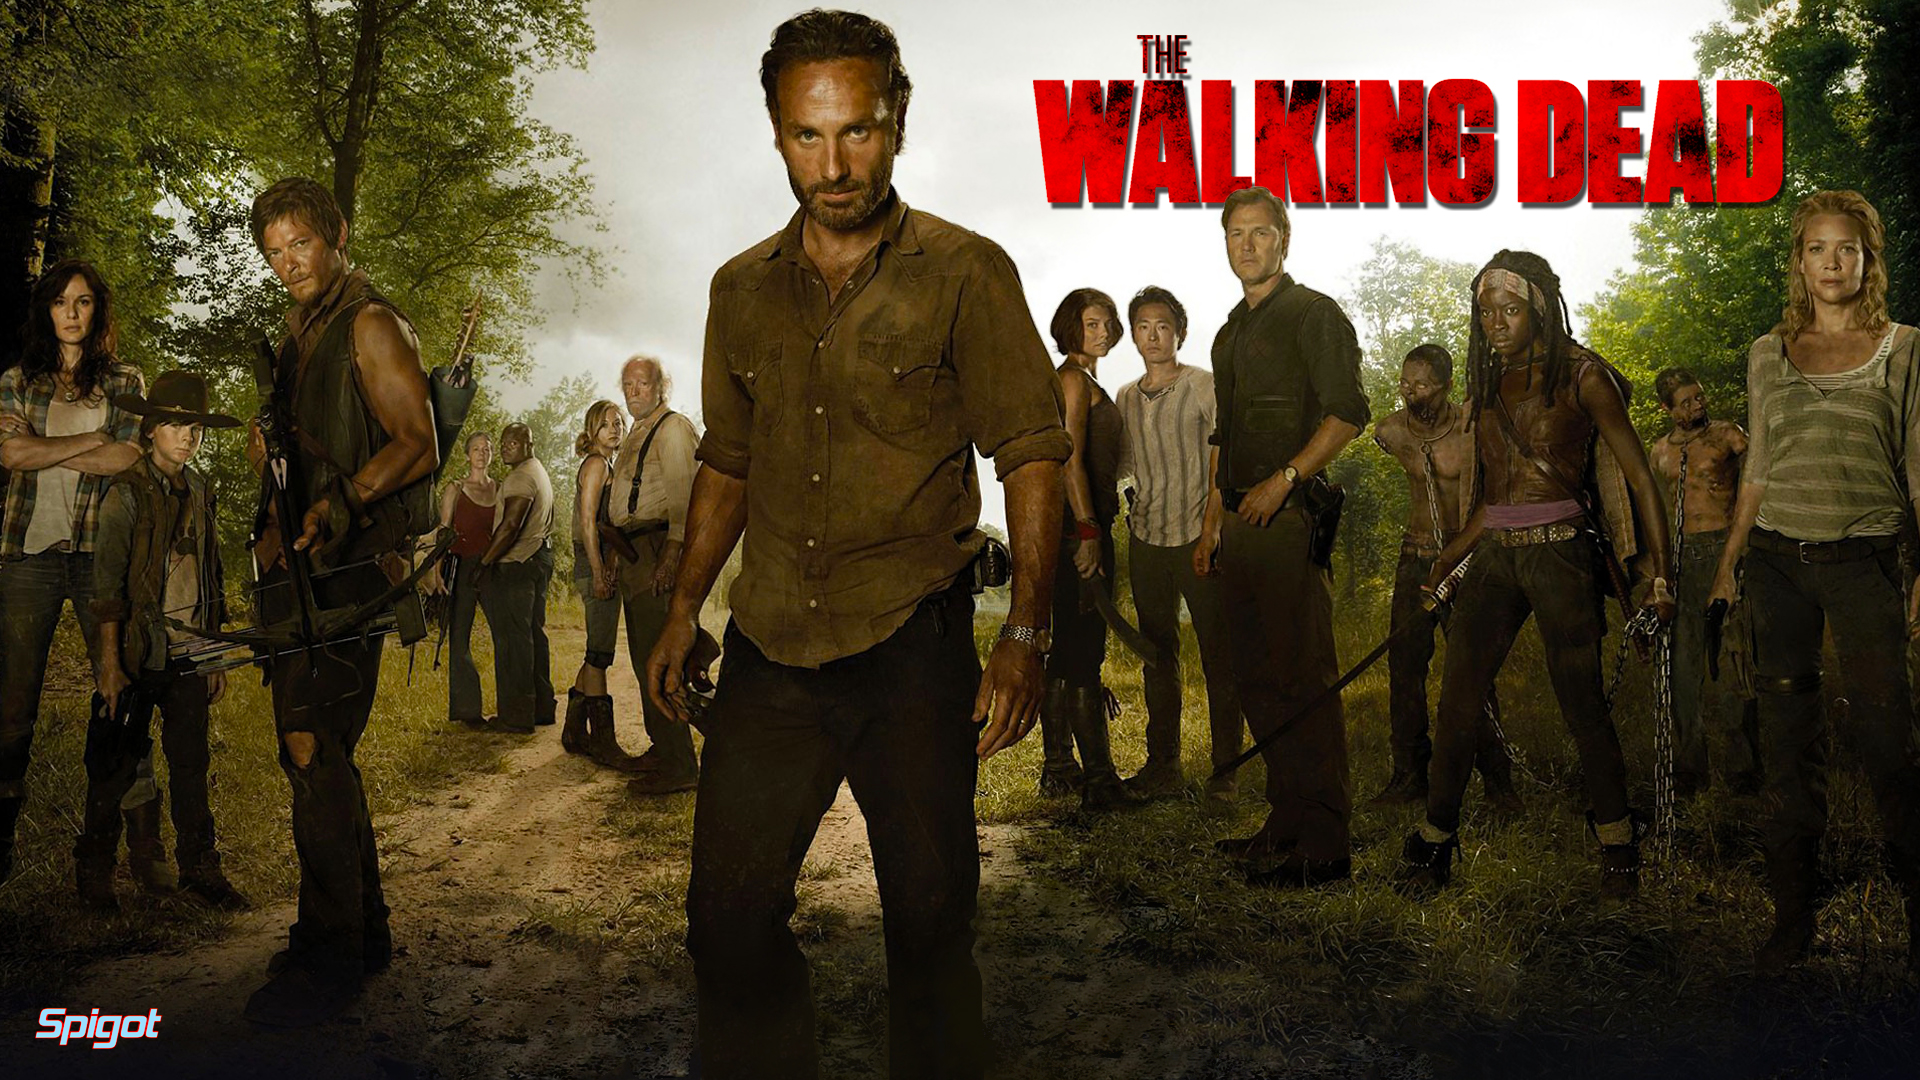 The walking dead george spigots blog the walking dead season 3 voltagebd Choice Image